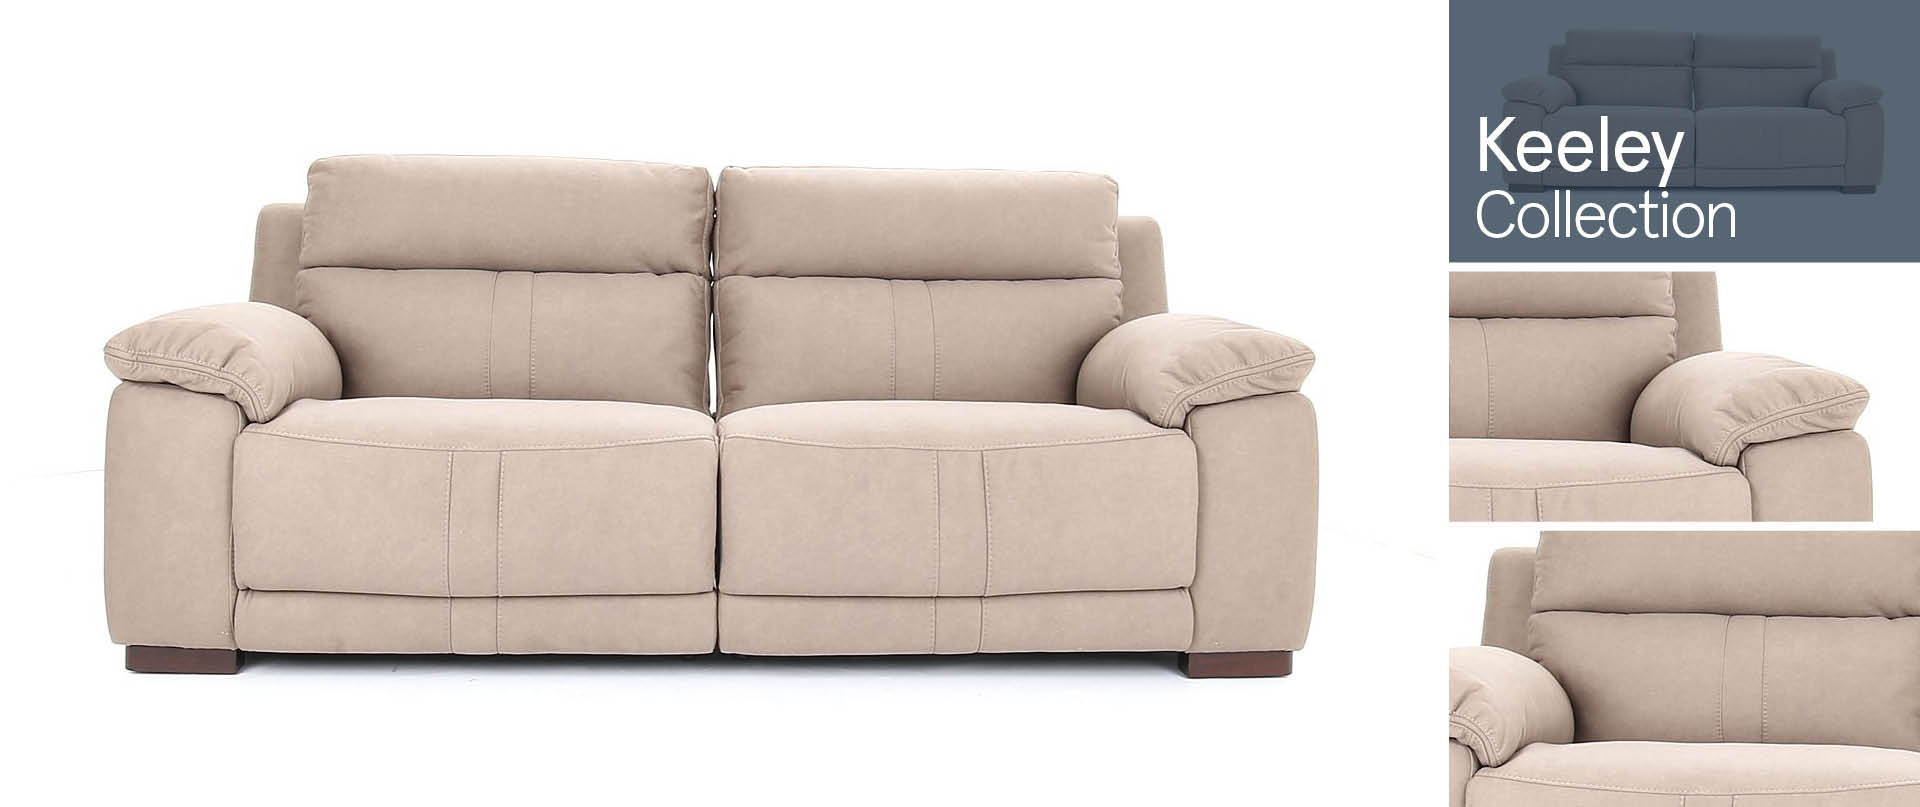 Keeley All Fabric Sofa Ranges